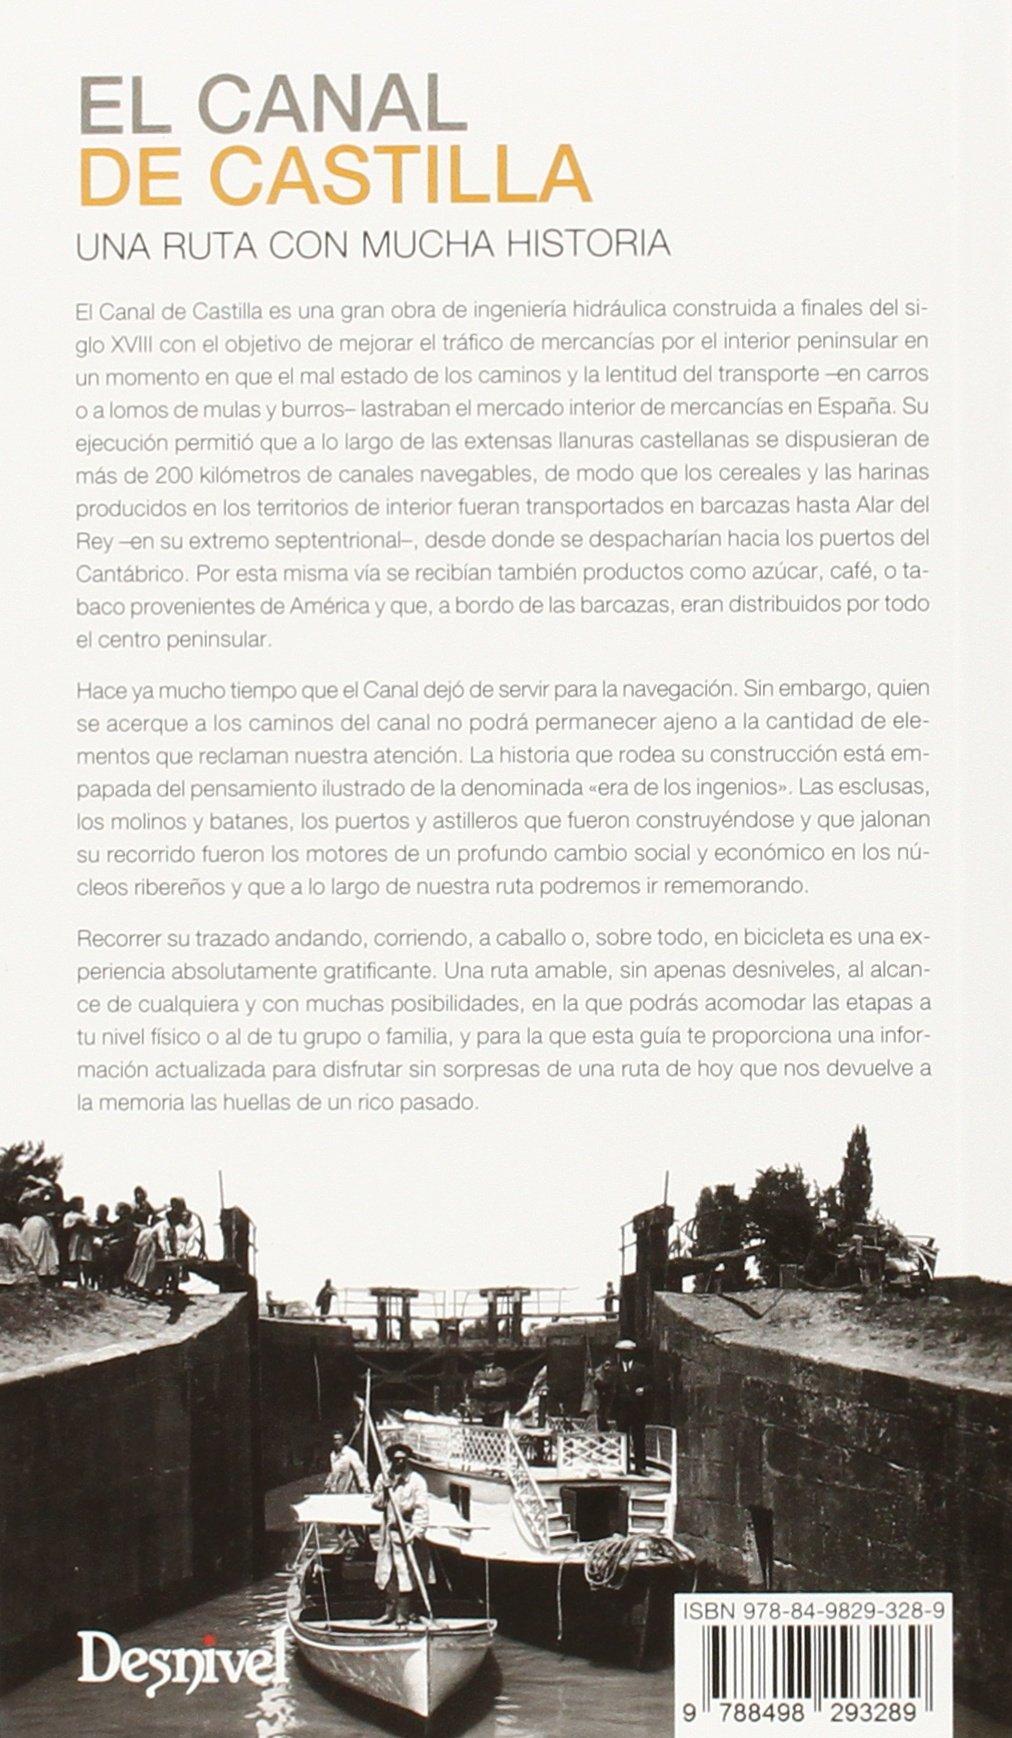 El-Canal-de-Castilla-Una-ruta-con-mucha-historia-Outdoor-desnivel